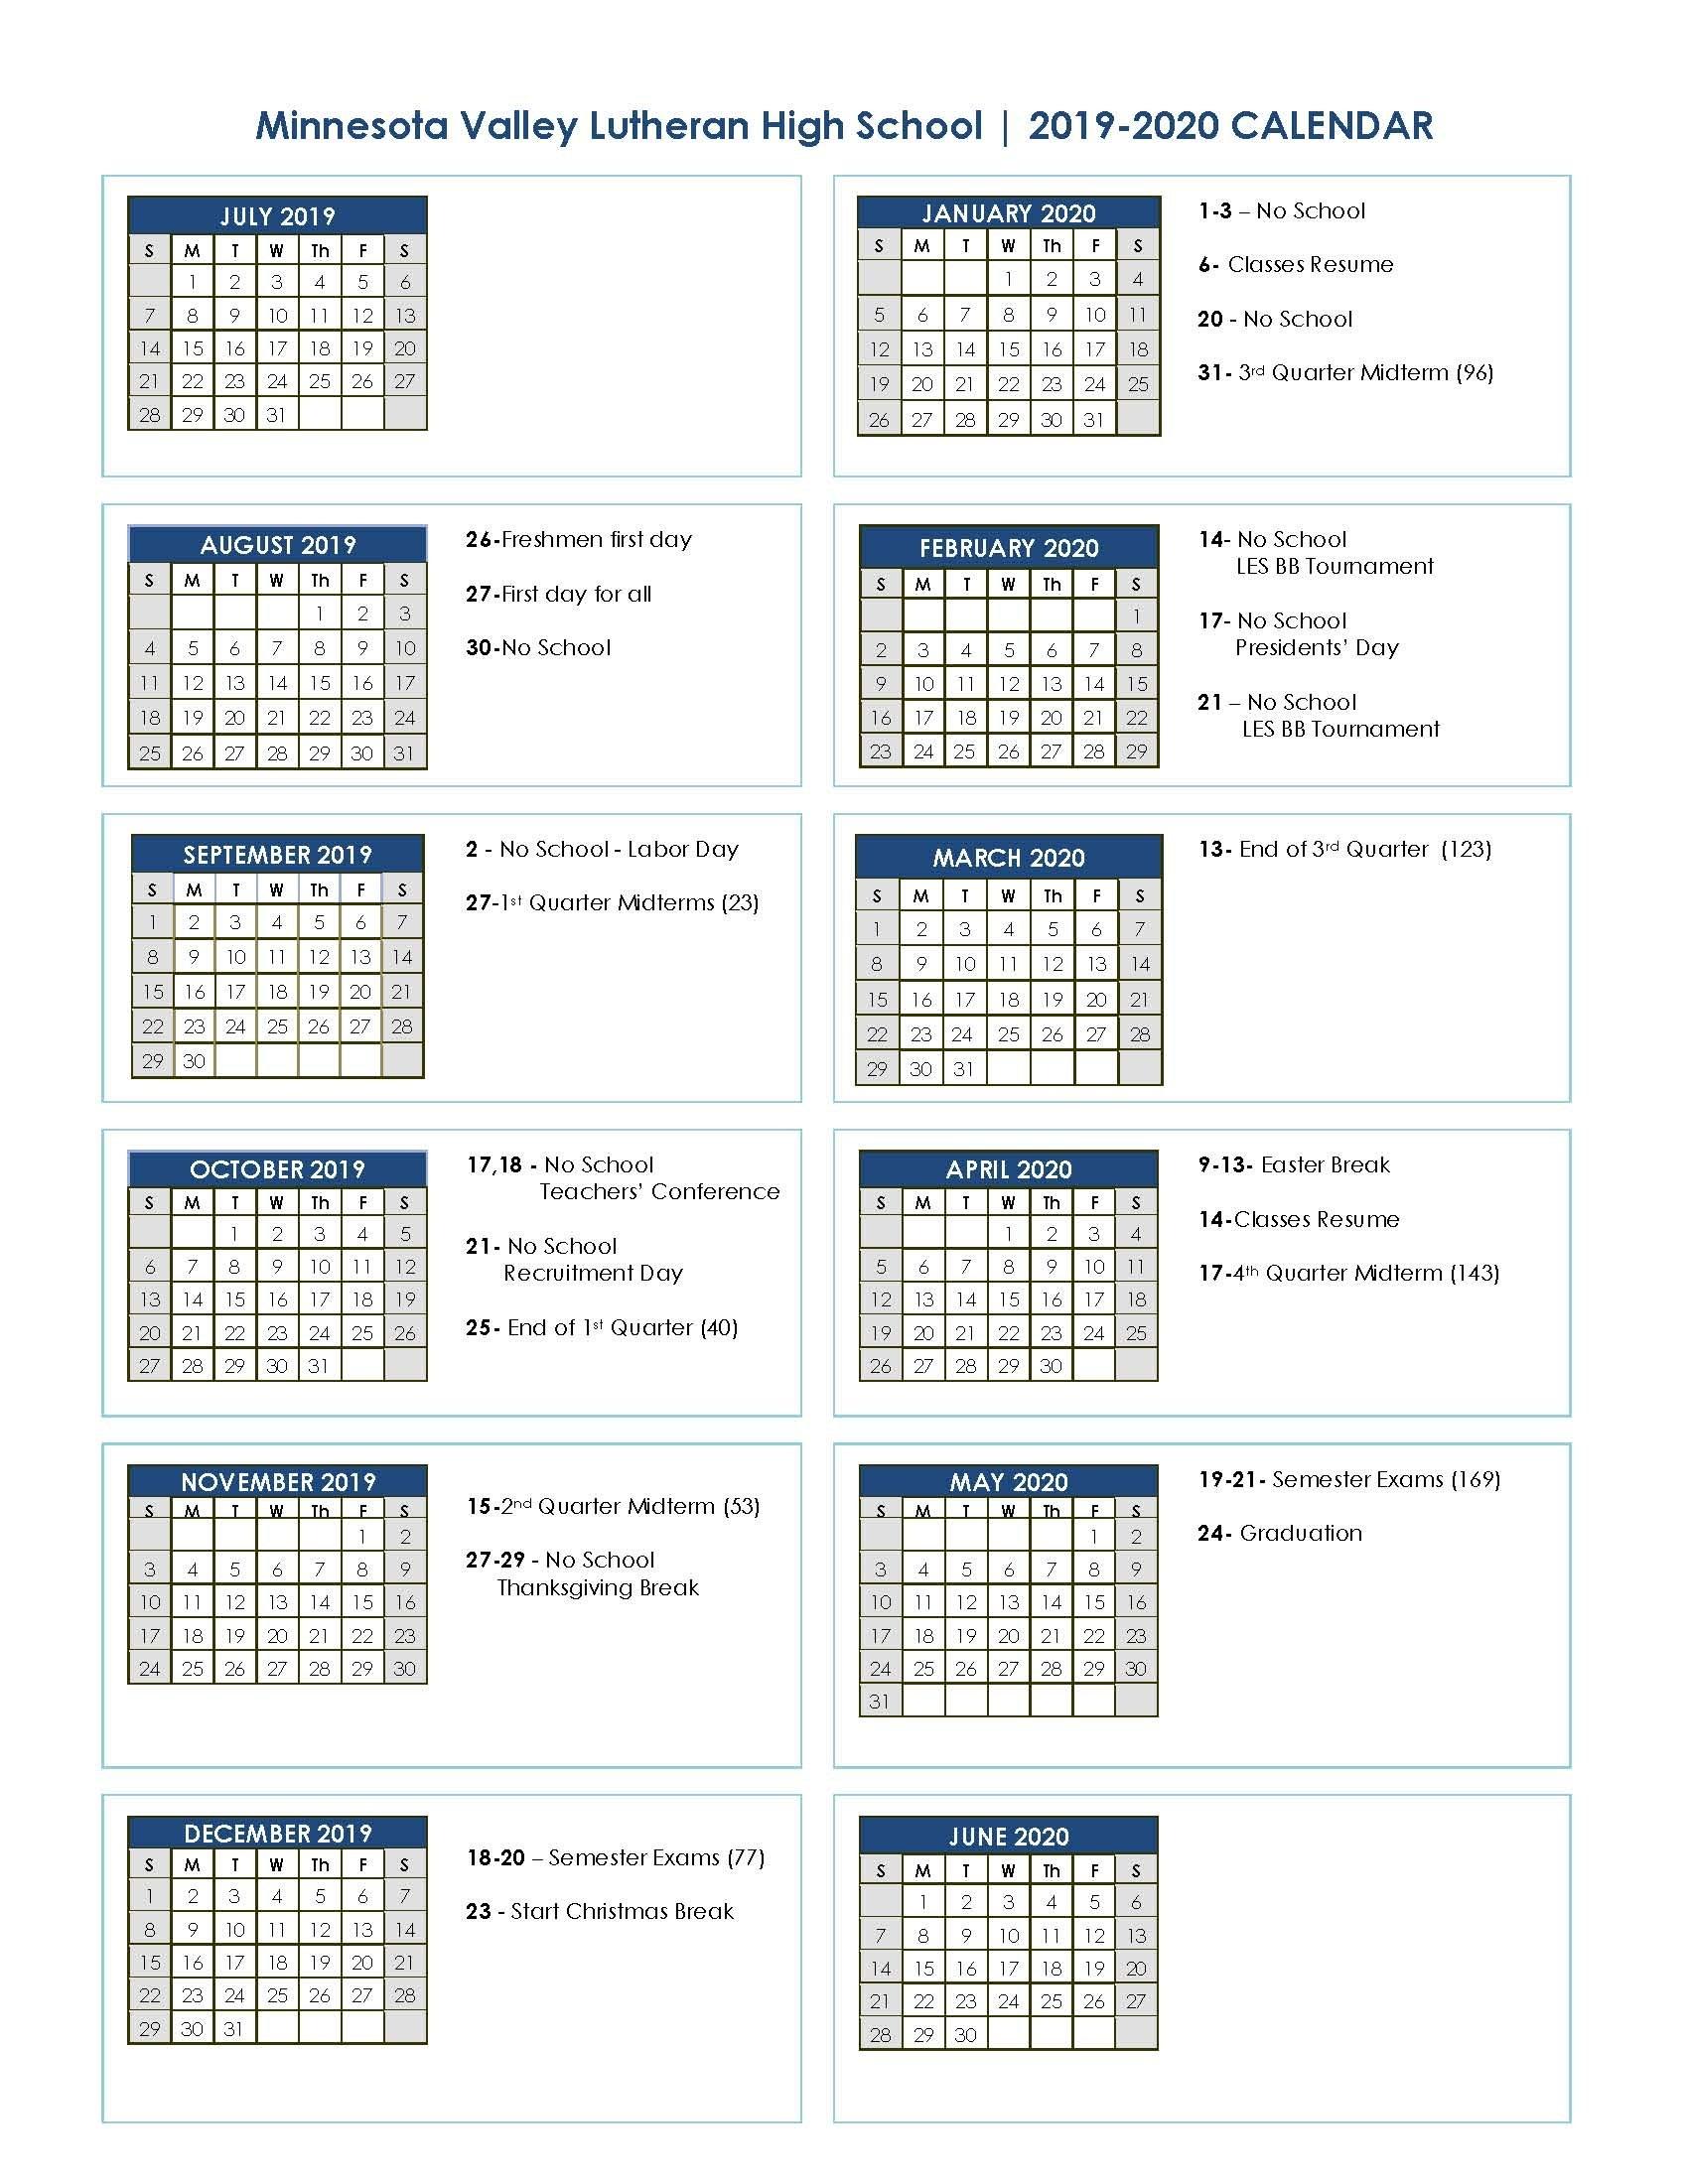 Academic Calendar 2019 2020 | Minnesota Valley Lutheran High School 3 Term Calendar 2019